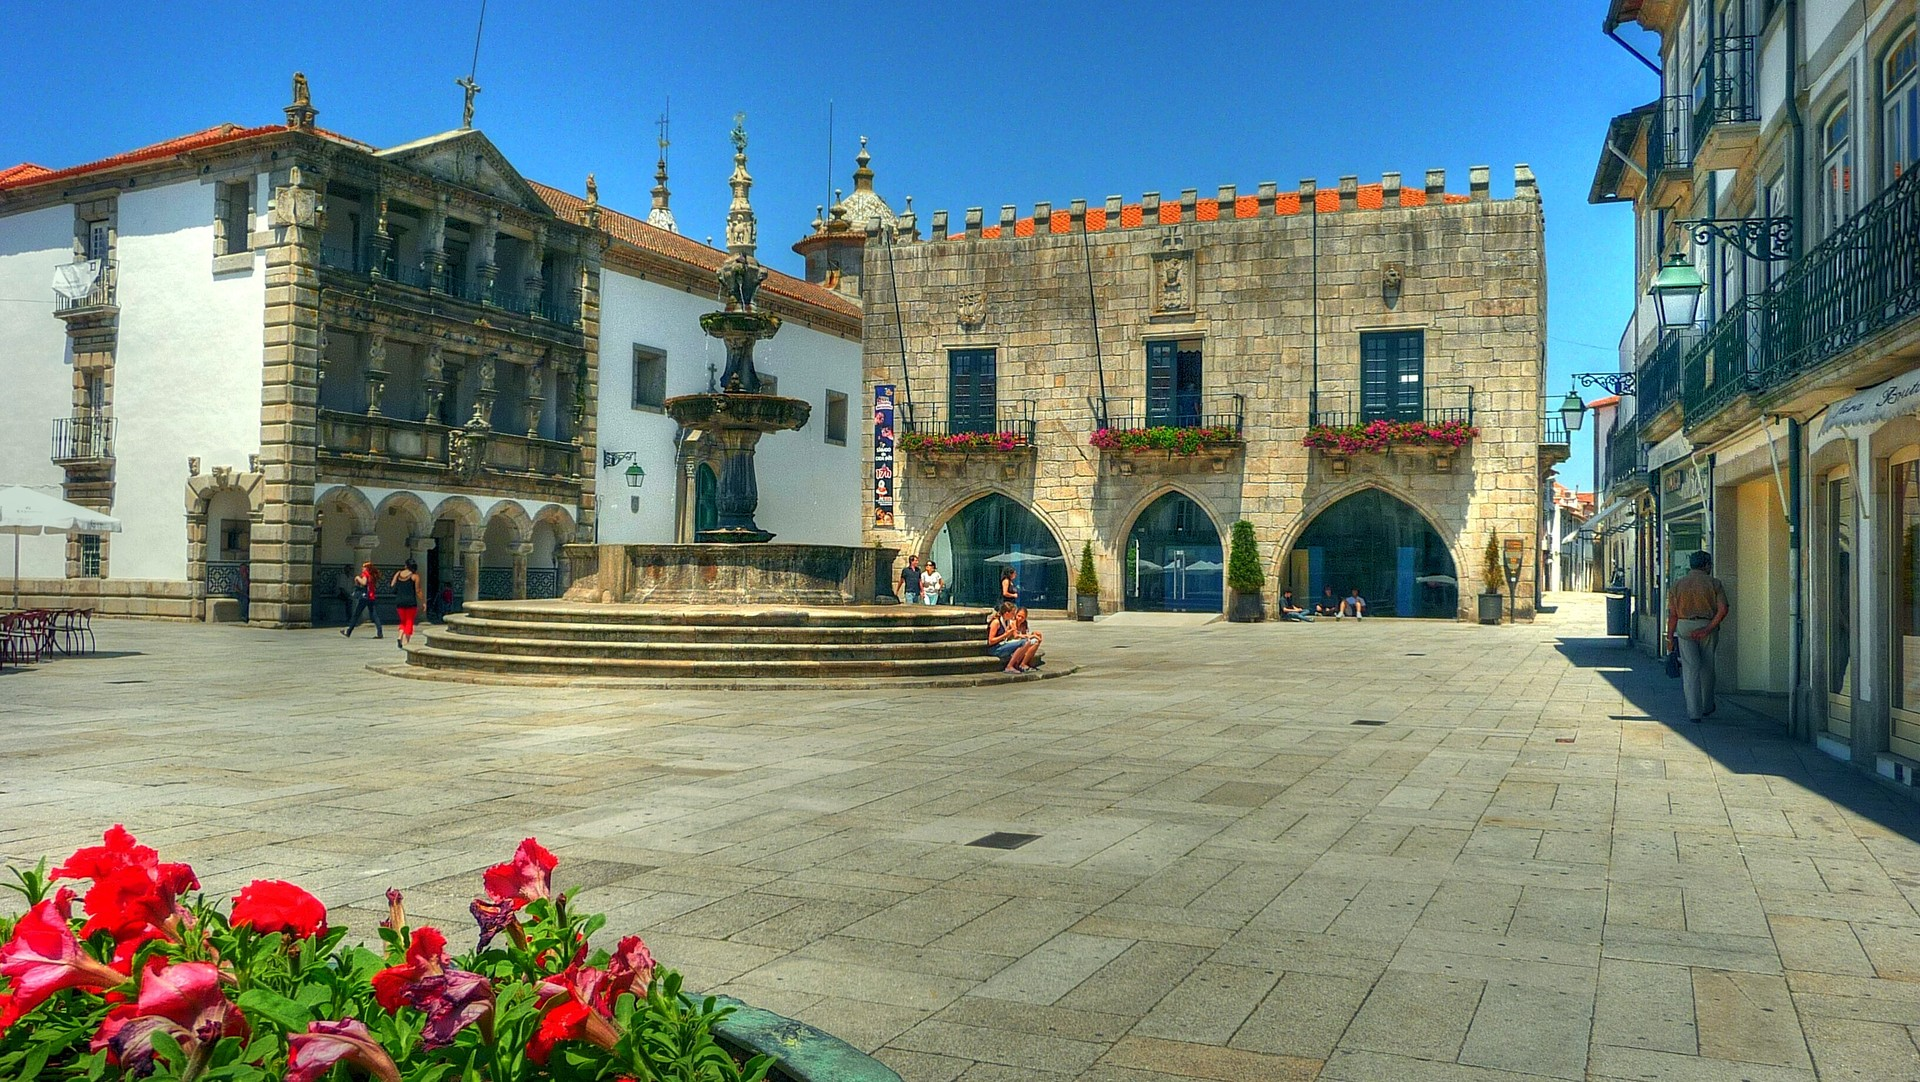 Come arrivare a Viana do Castelo da Braga?